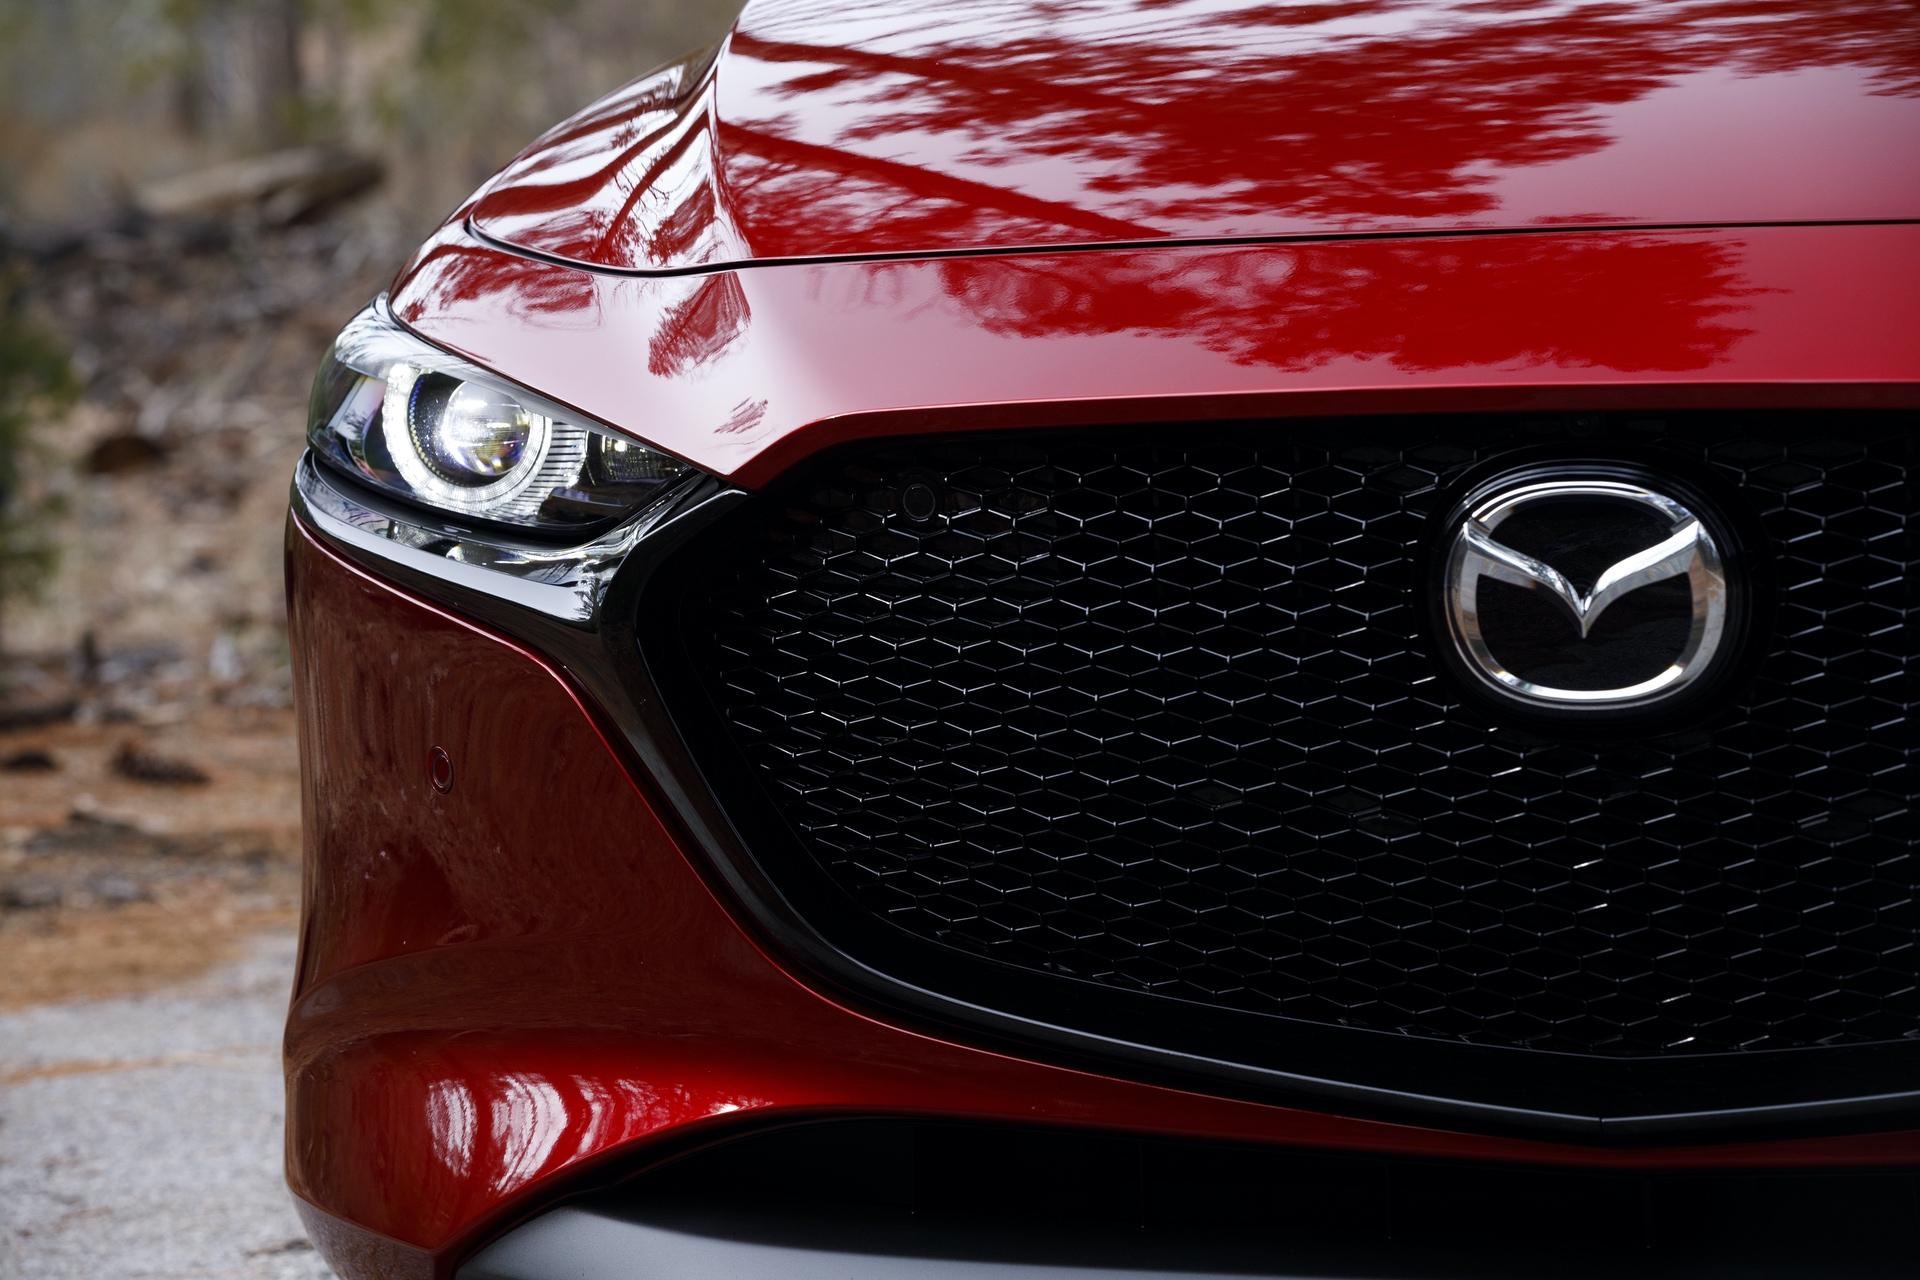 2019-Mazda3-Hatchback_16